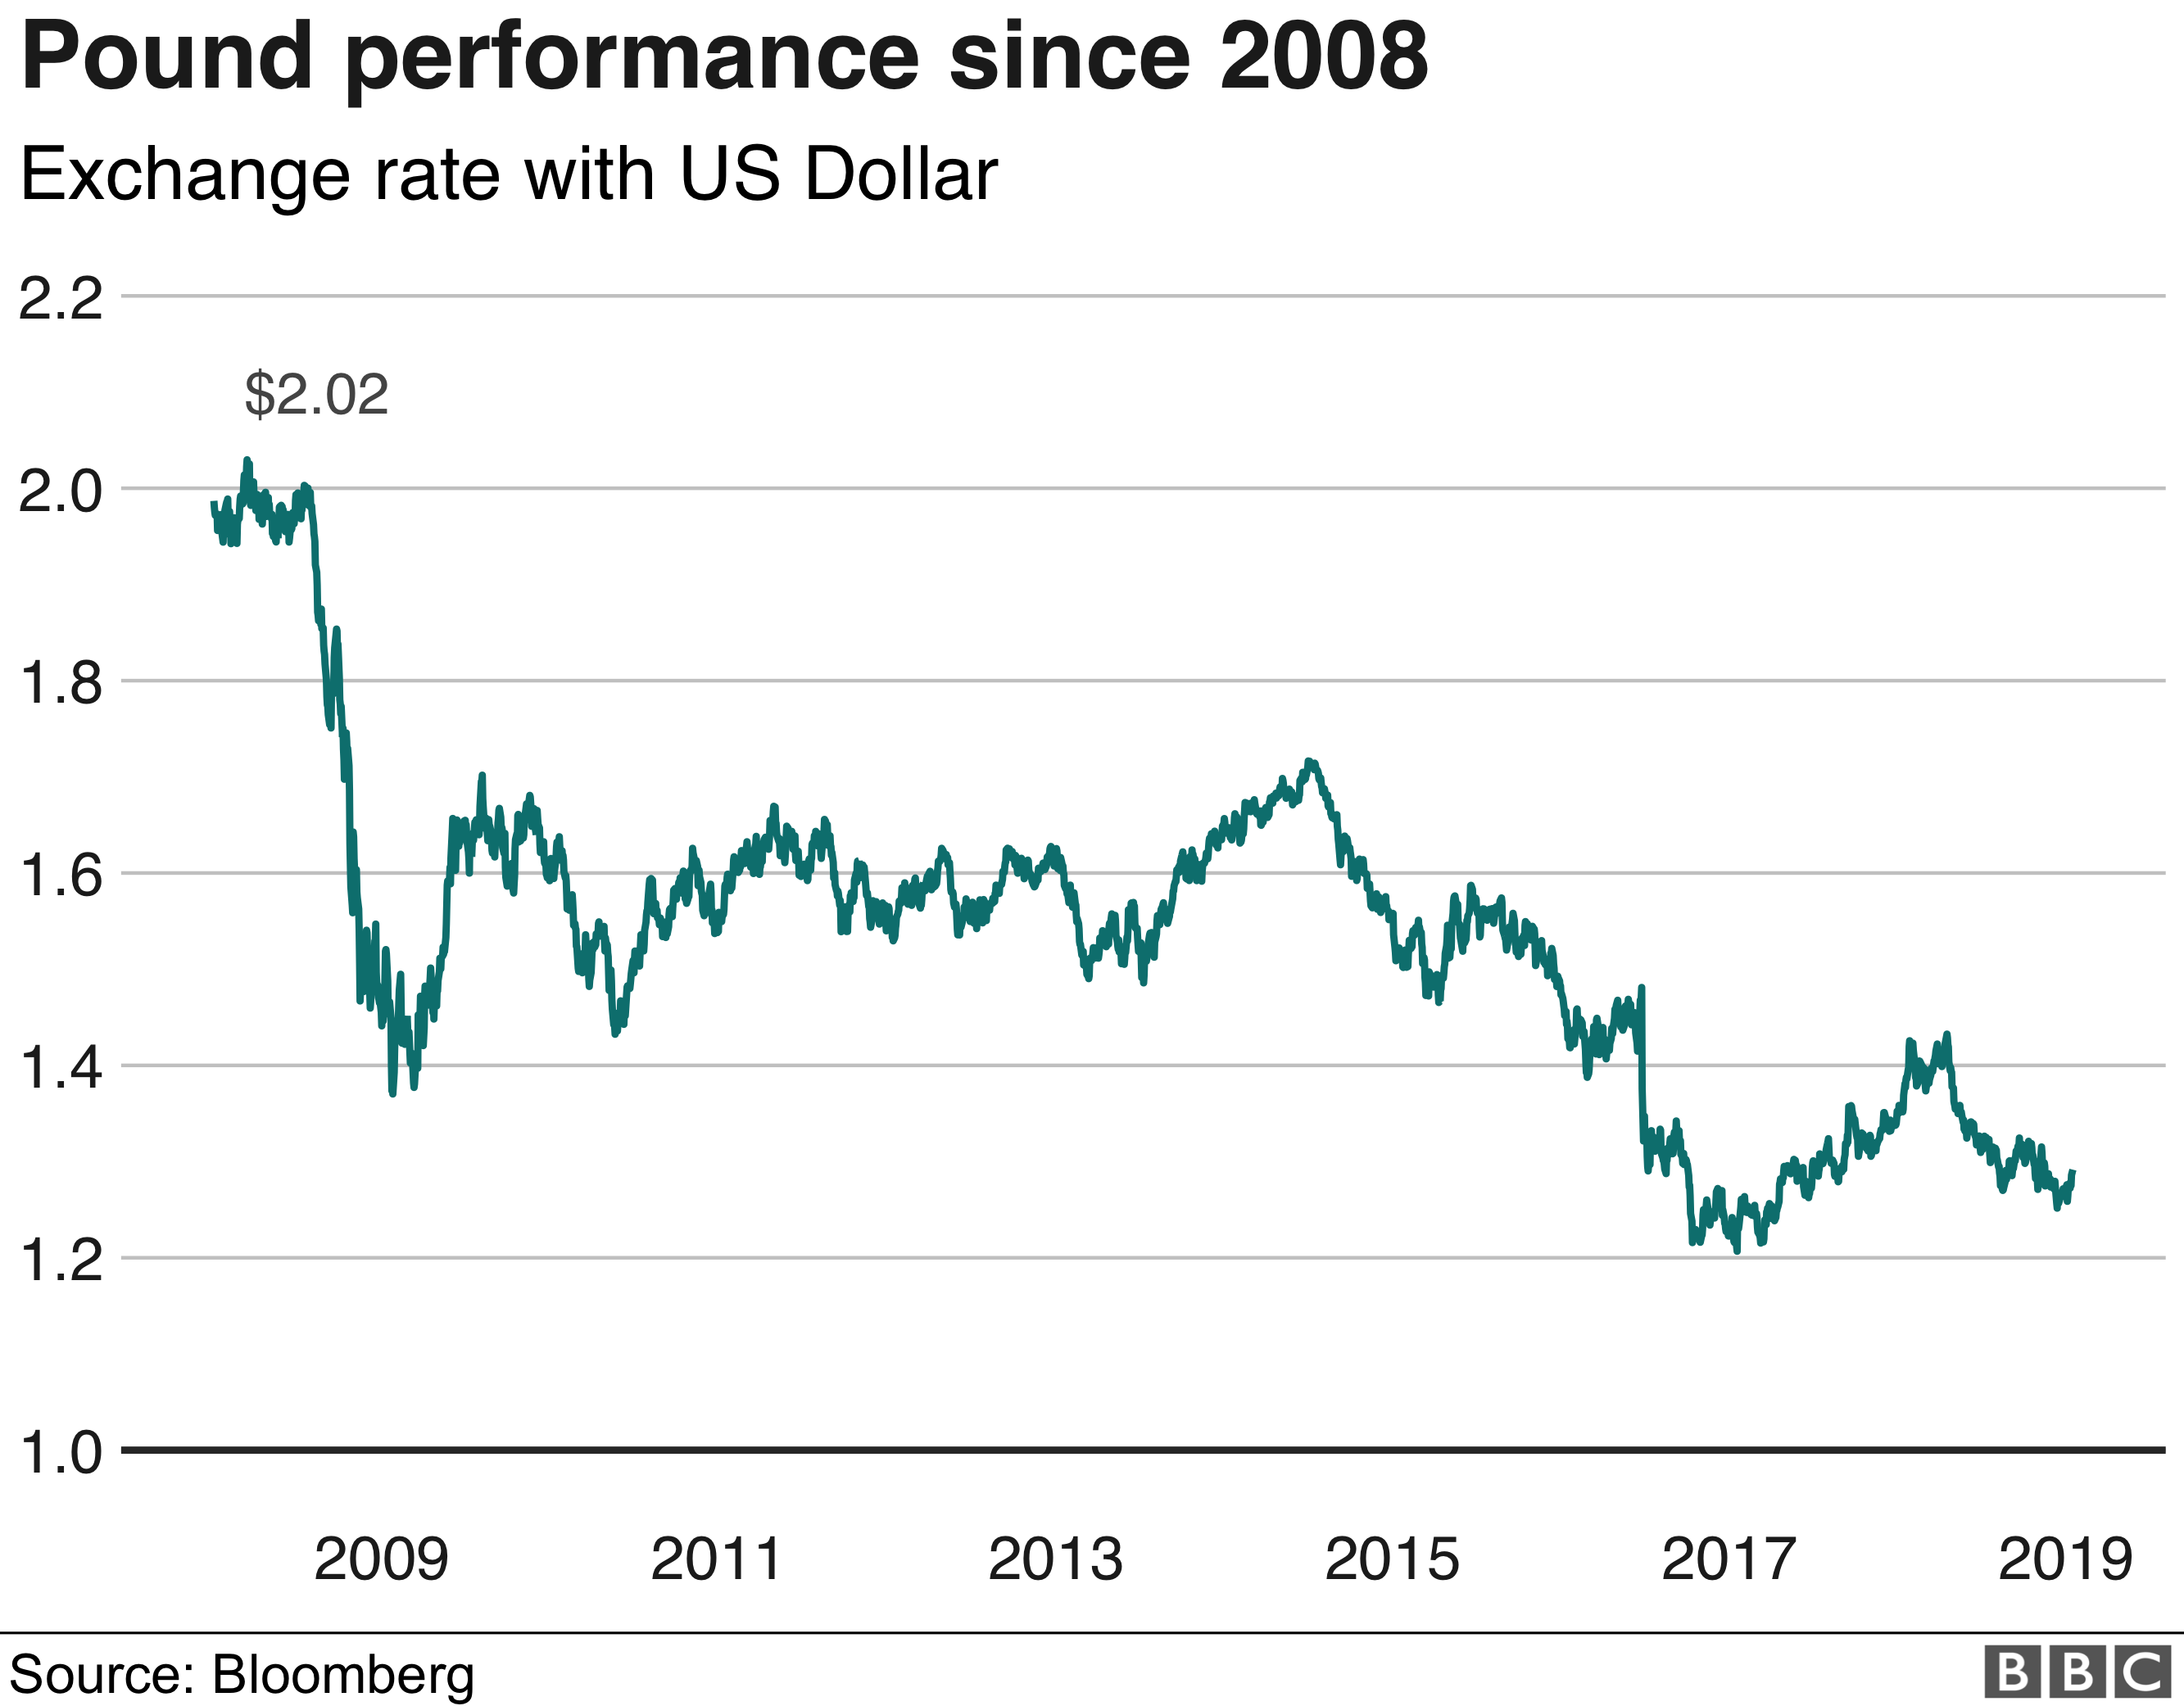 Pound since 2008